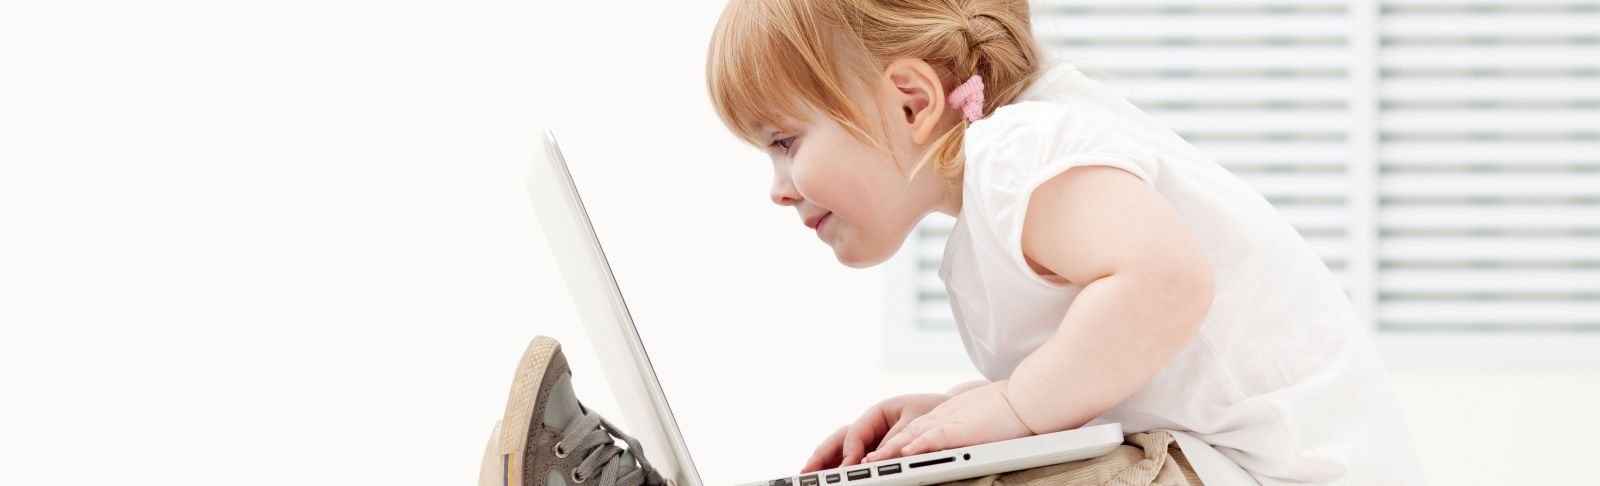 Les eines digitals ja formen part dels recursos educatius   Acistock